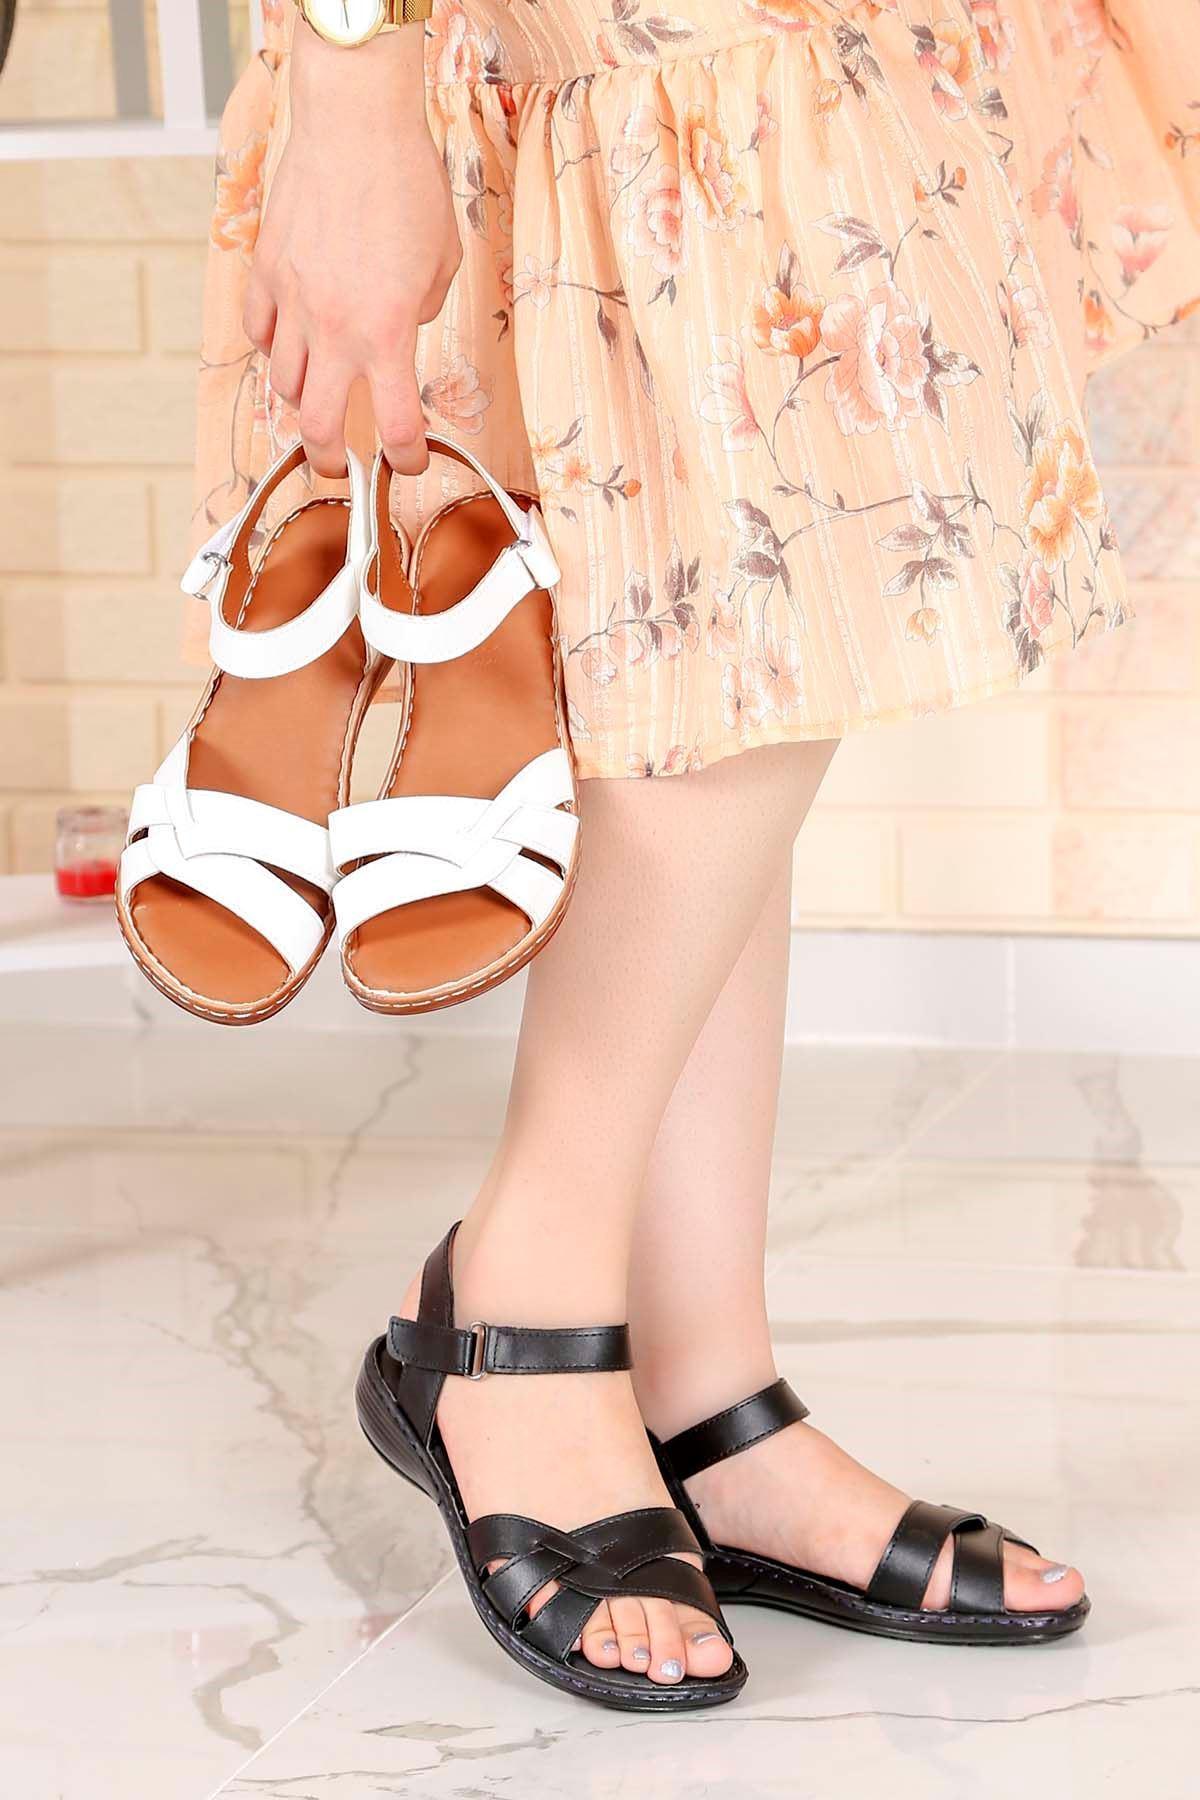 My-Fit-355 Sandalet Siyah  Deri